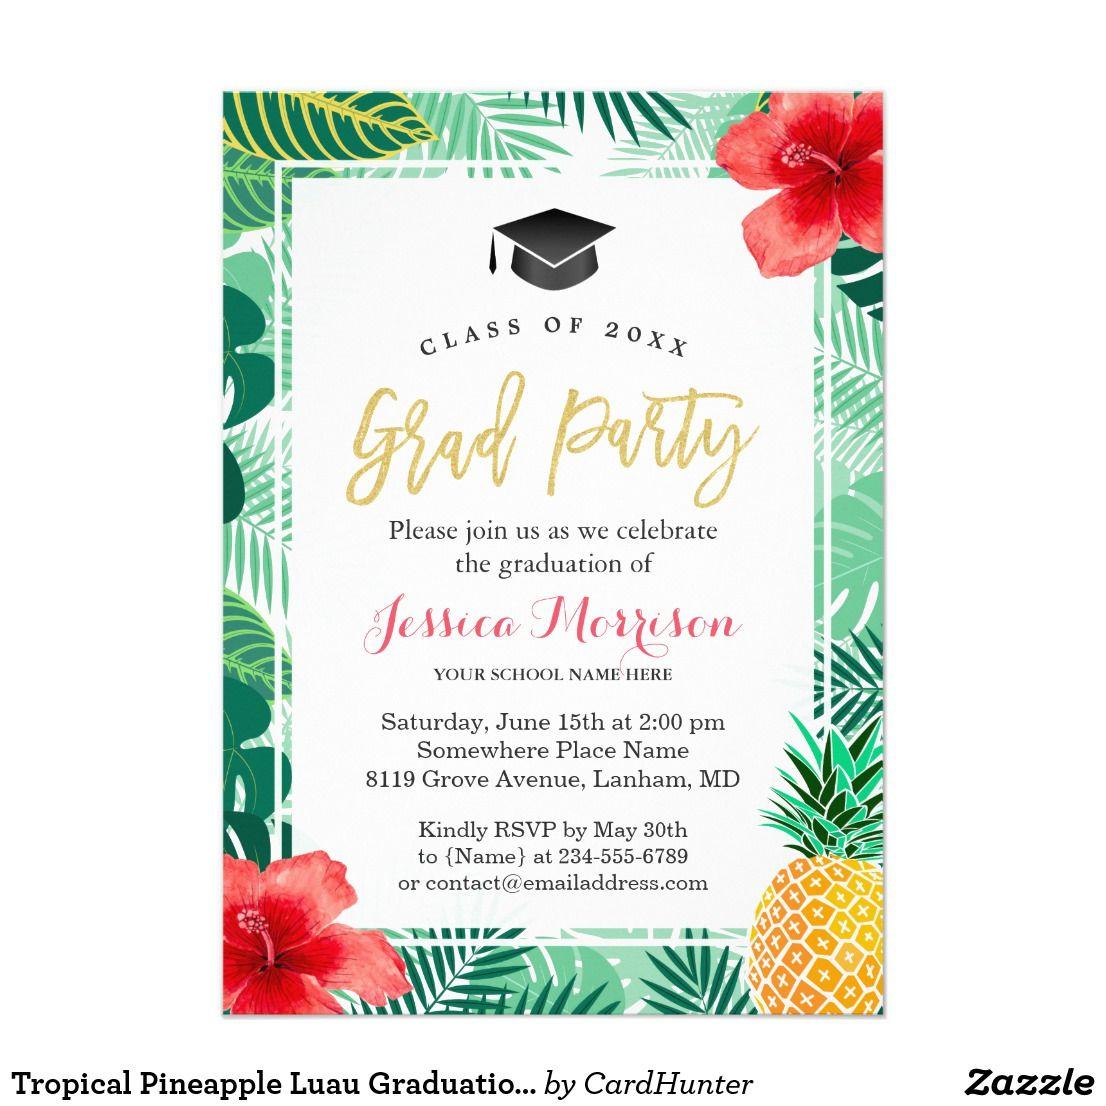 Tropical Pineapple Luau Graduation Party Card Graduation Party